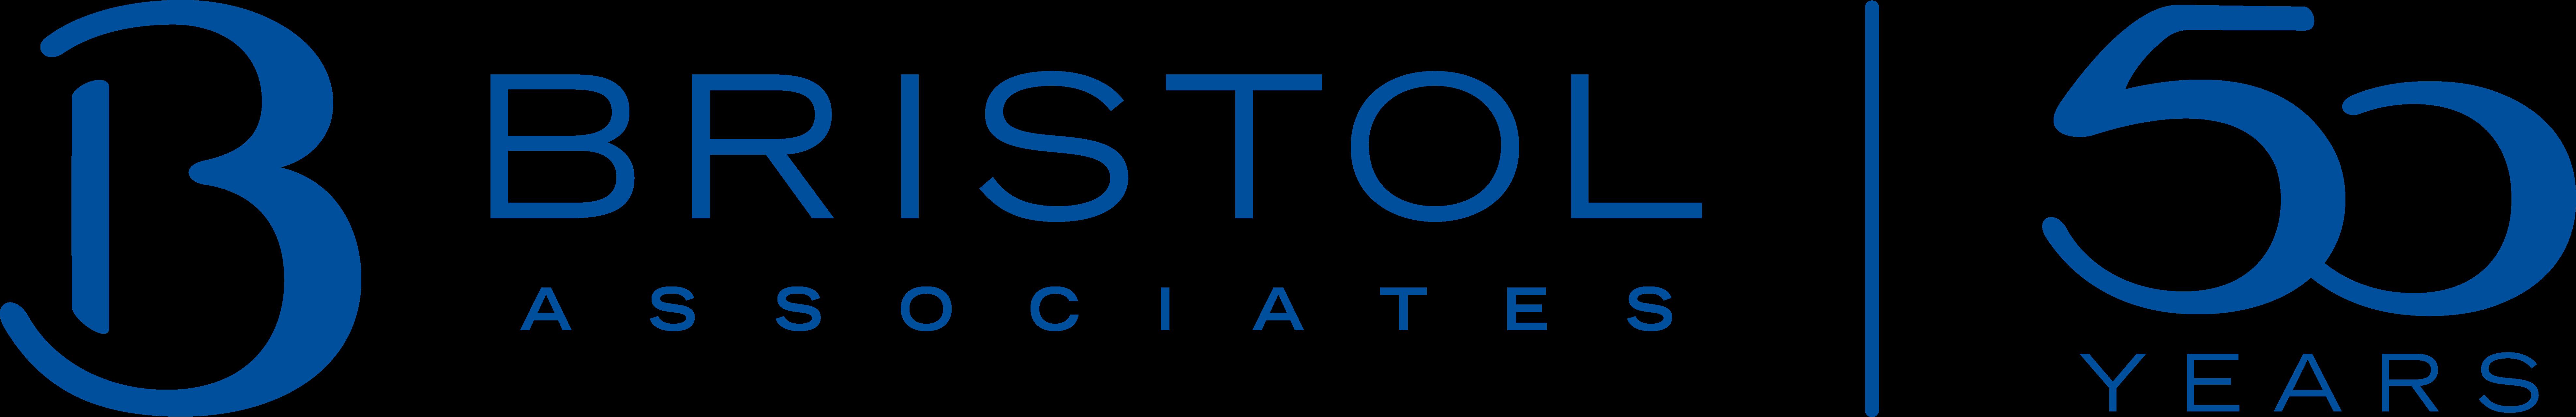 Bristol Associates, Inc